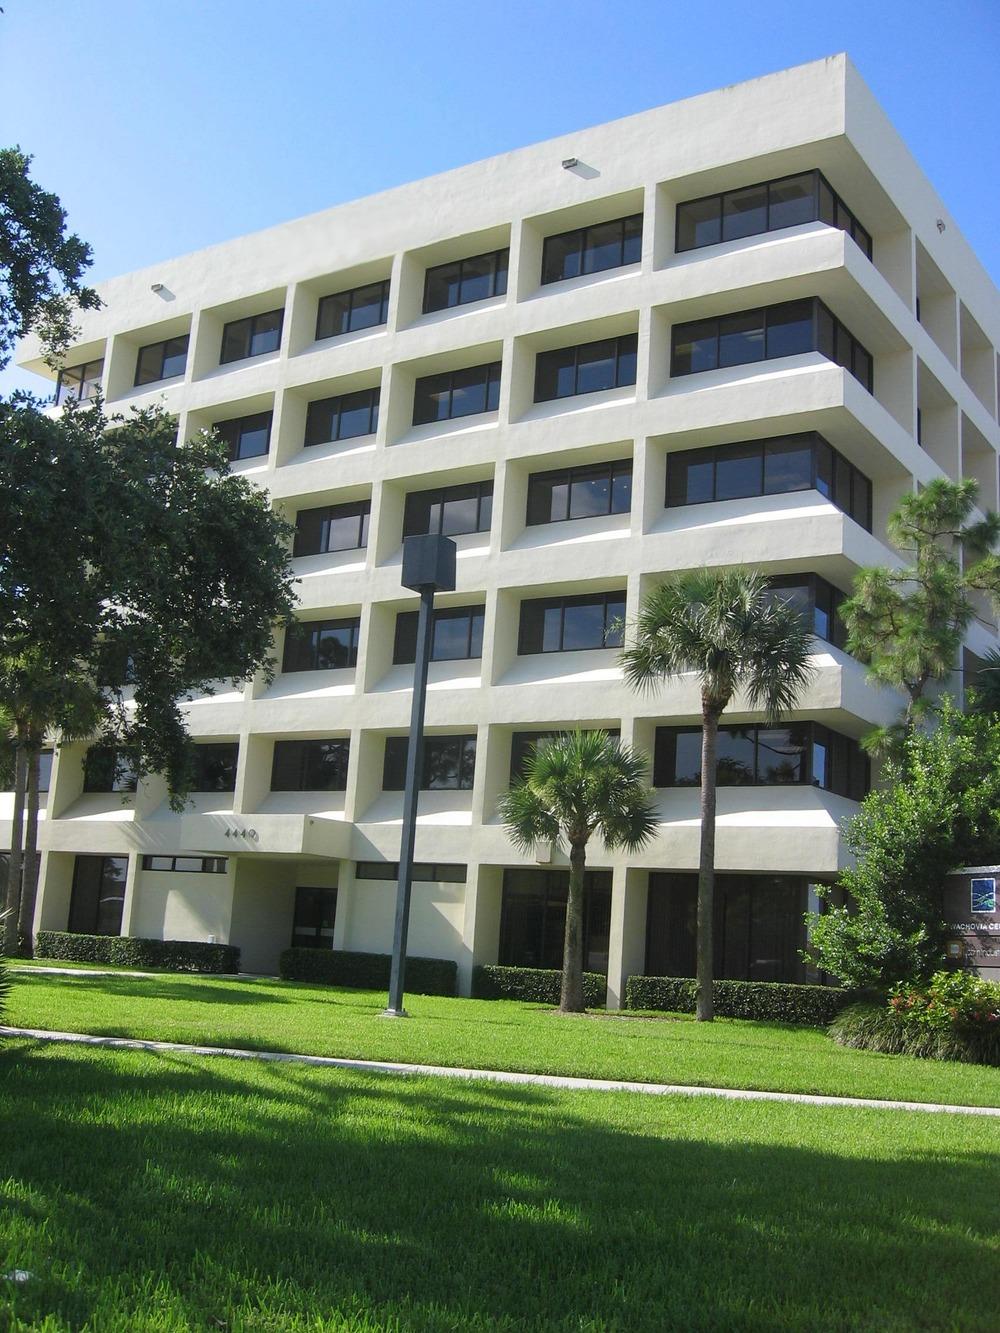 Intelligent Office - 4440 PGA Blvd. - Palm Beach Gardens, FL